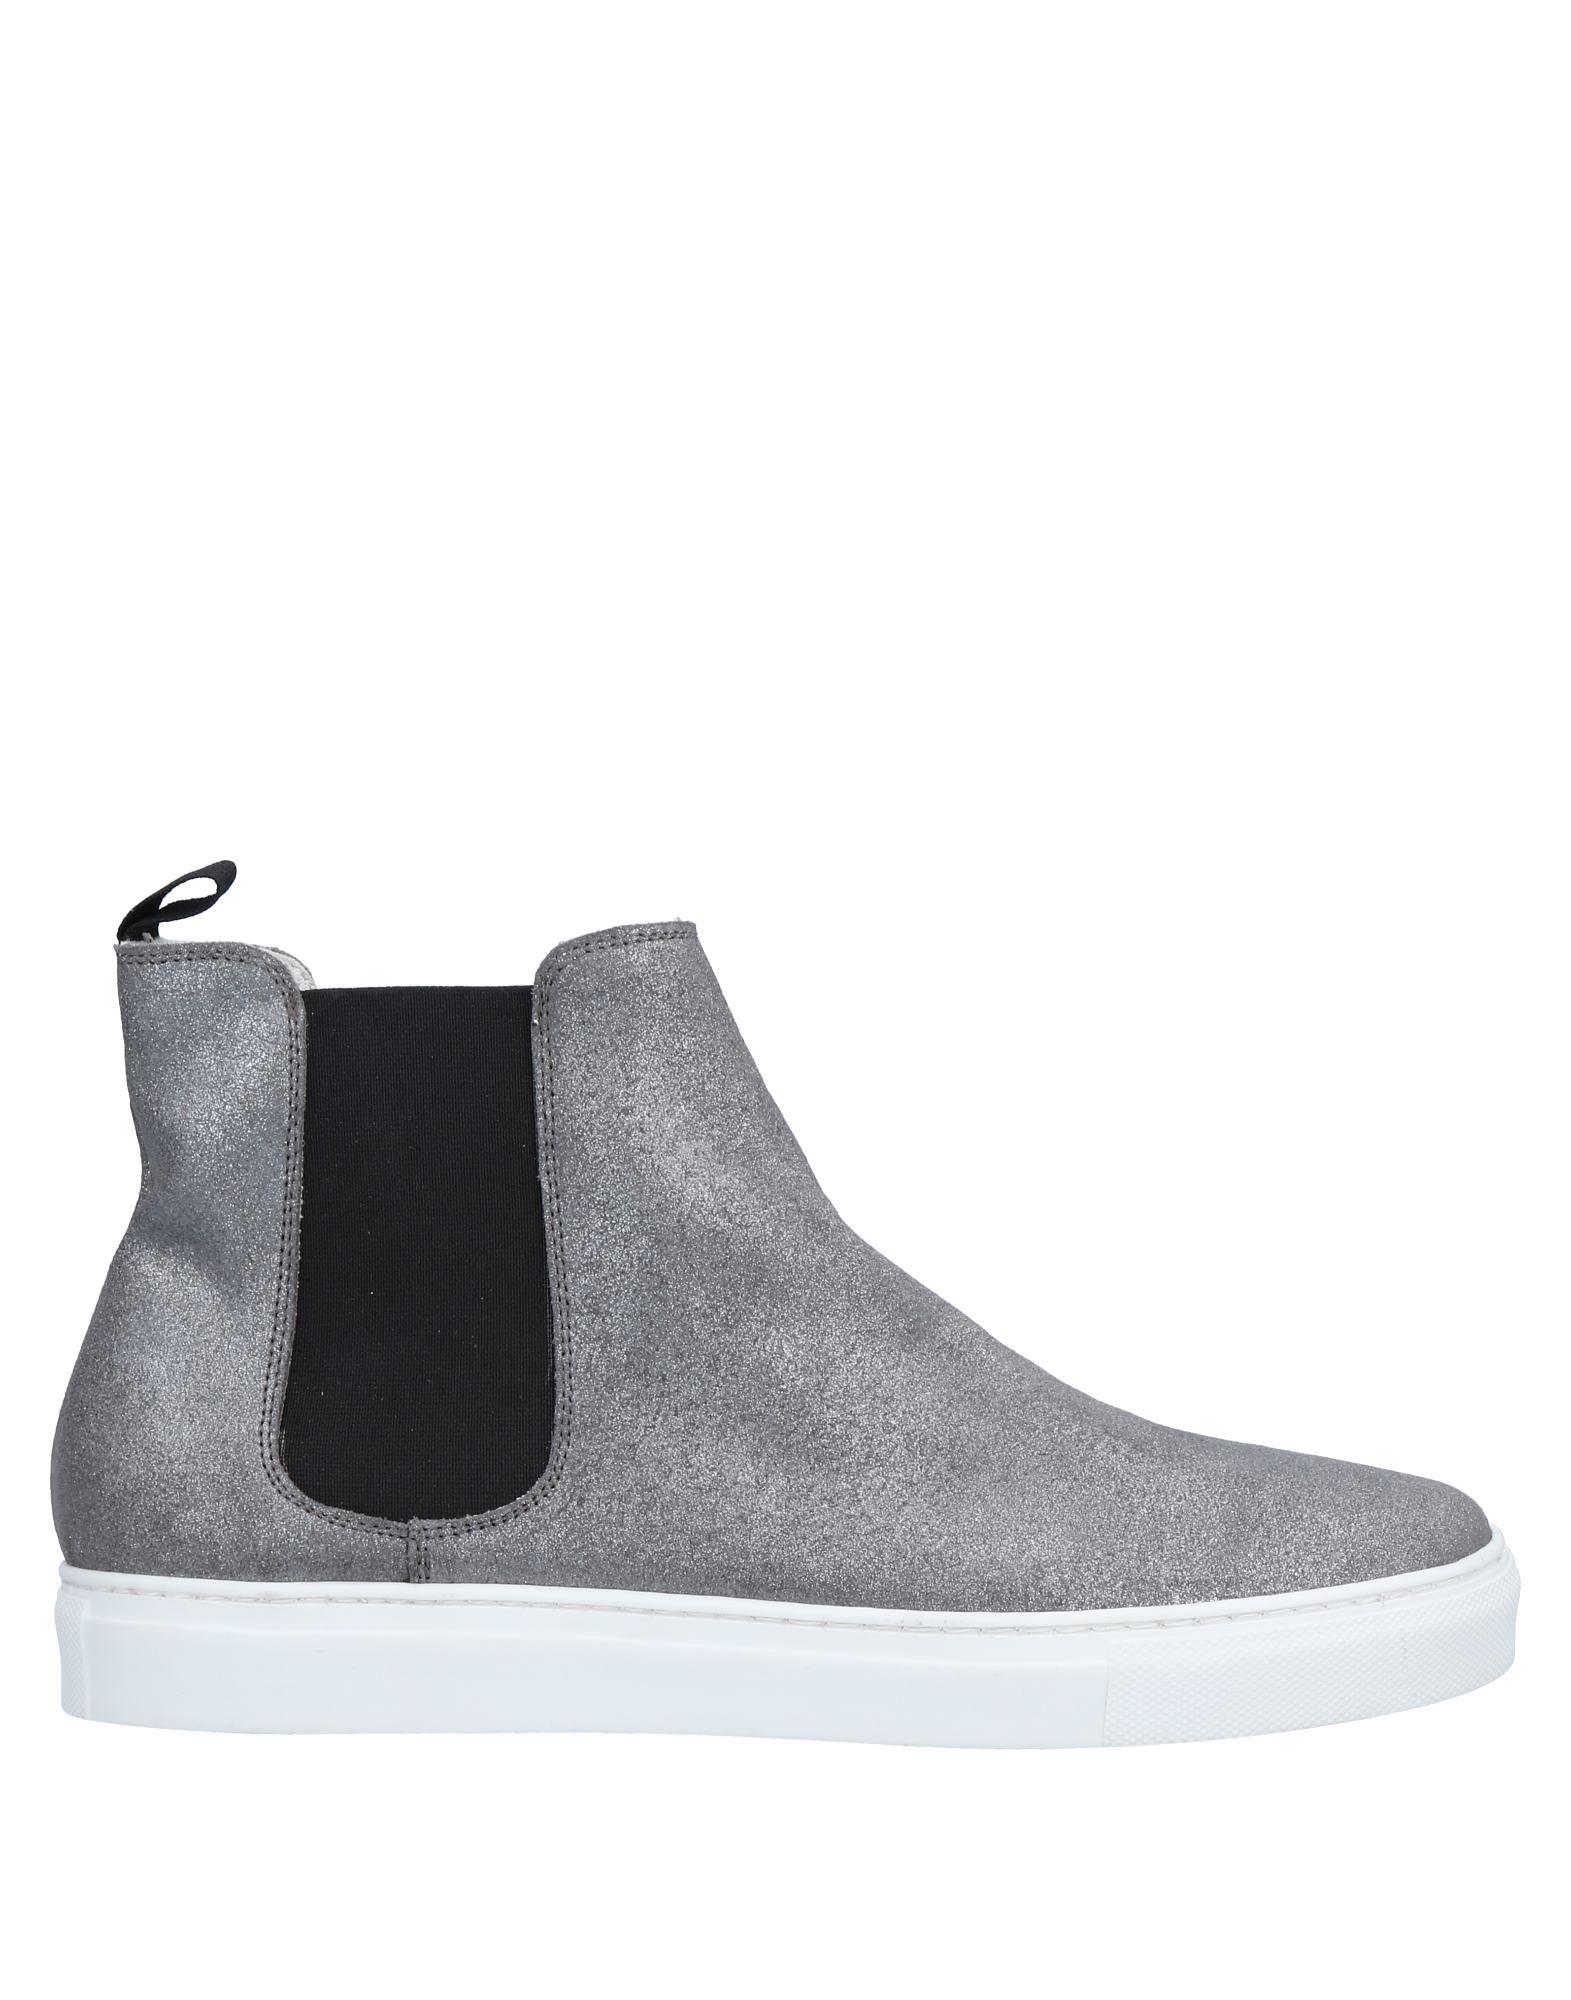 WHITE MILLAN Высокие кеды и кроссовки кеды кроссовки высокие dc evan hi zero black white